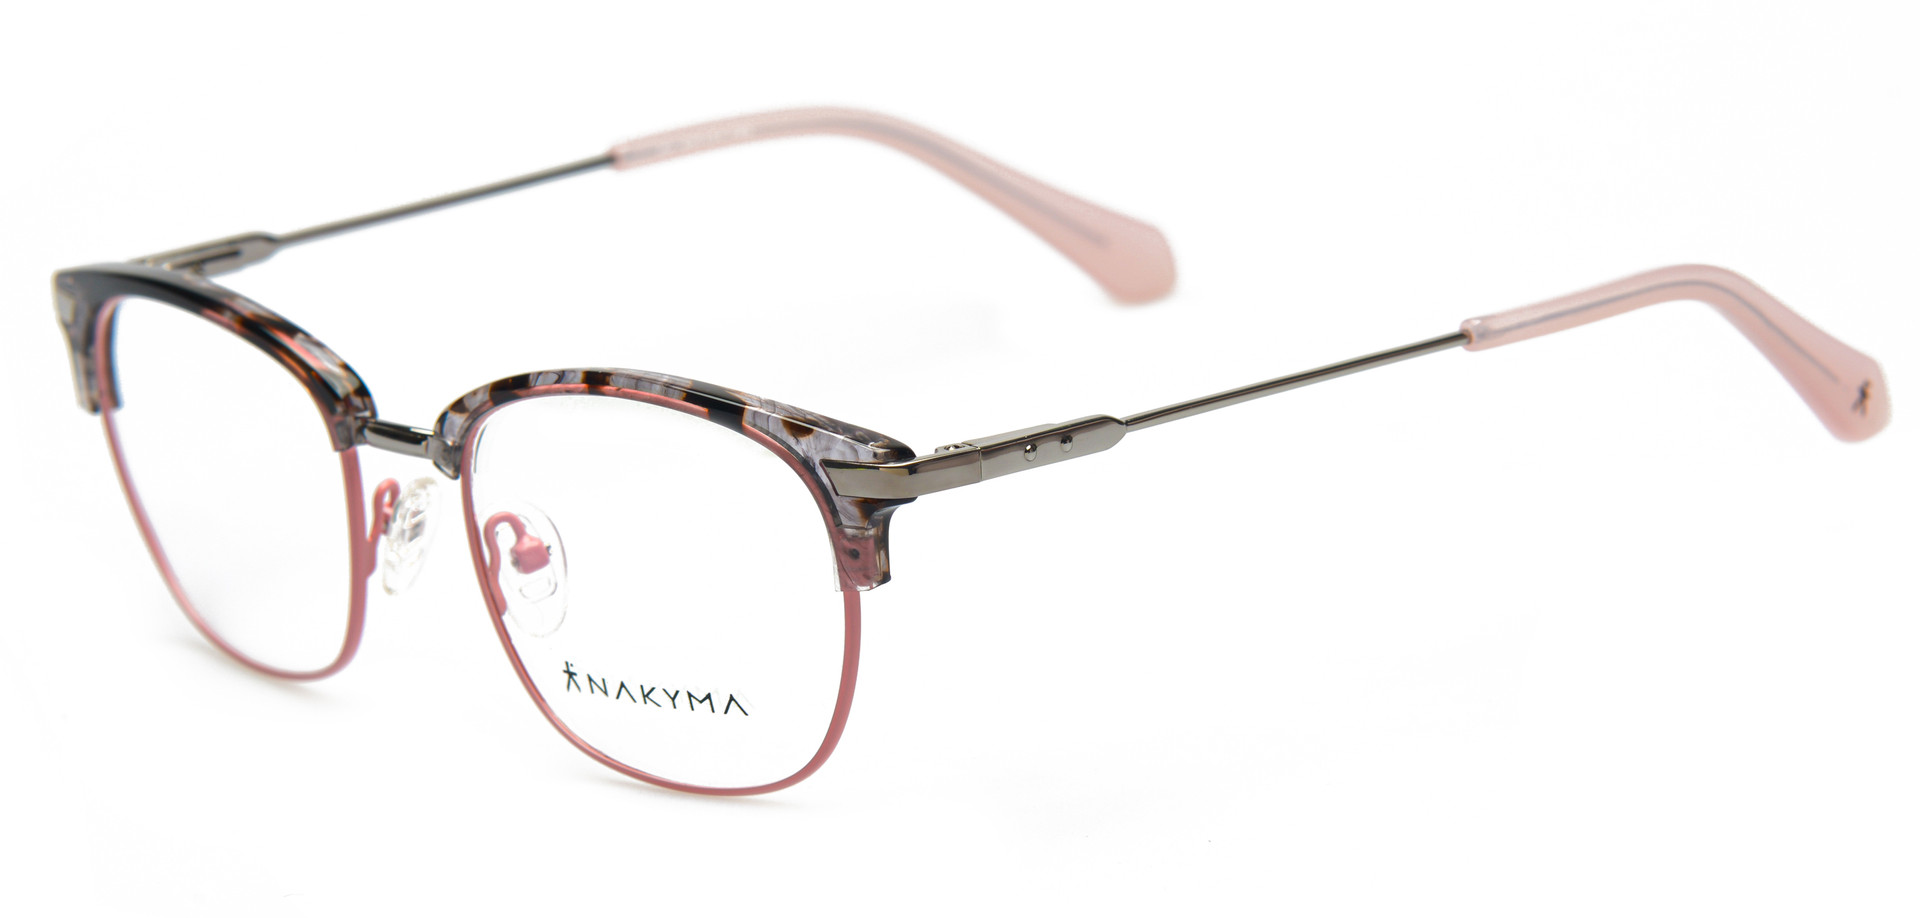 8R1-NAKYMA-V09-C1